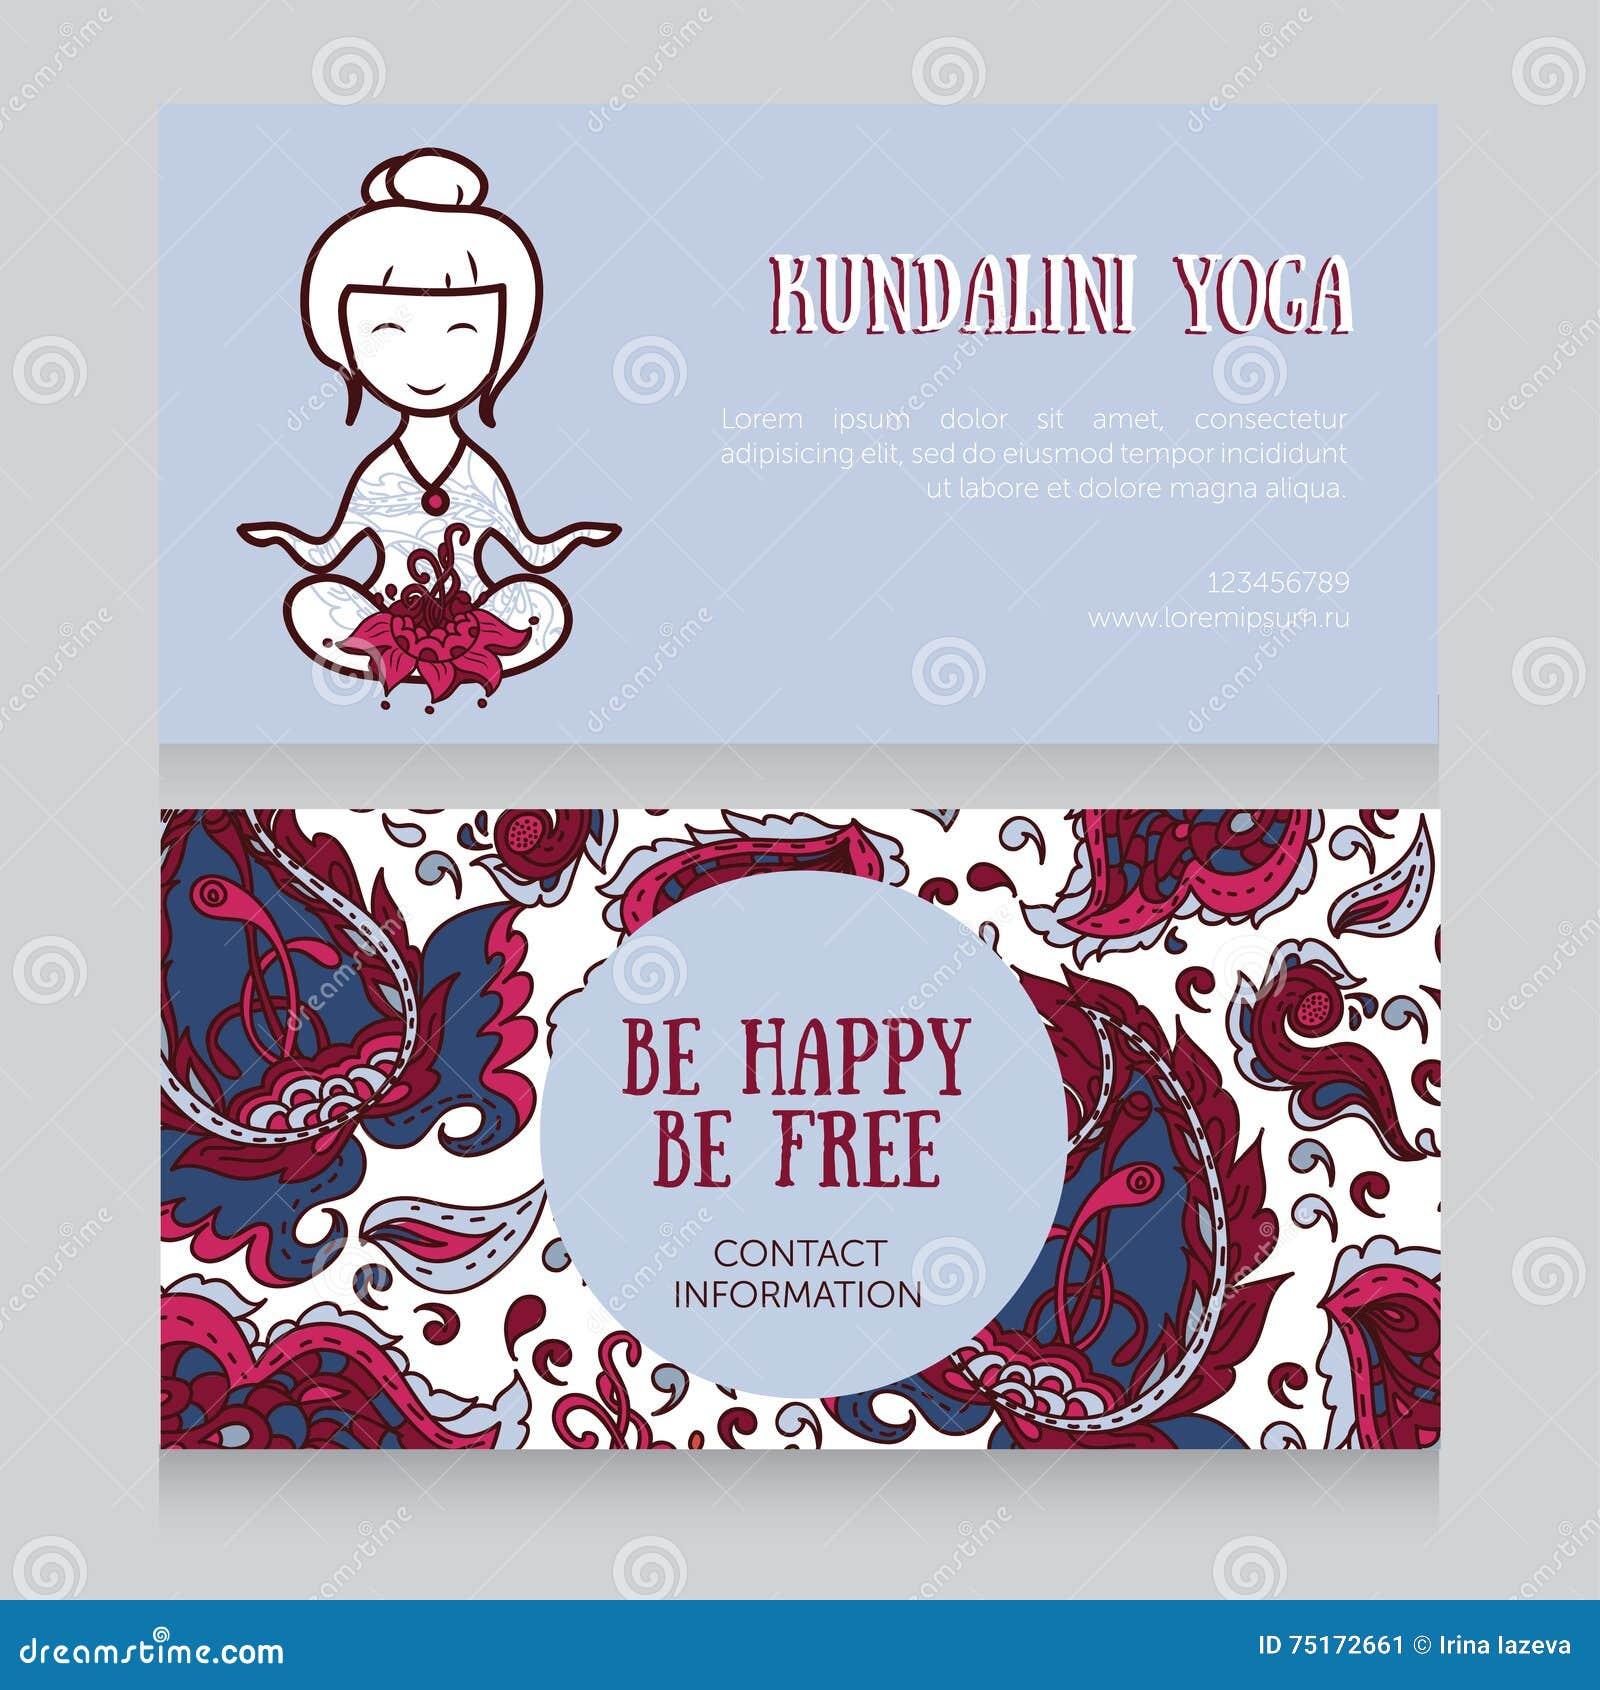 Template for kundalini yoga studio business card stock vector template for kundalini yoga studio business card stock image reheart Image collections